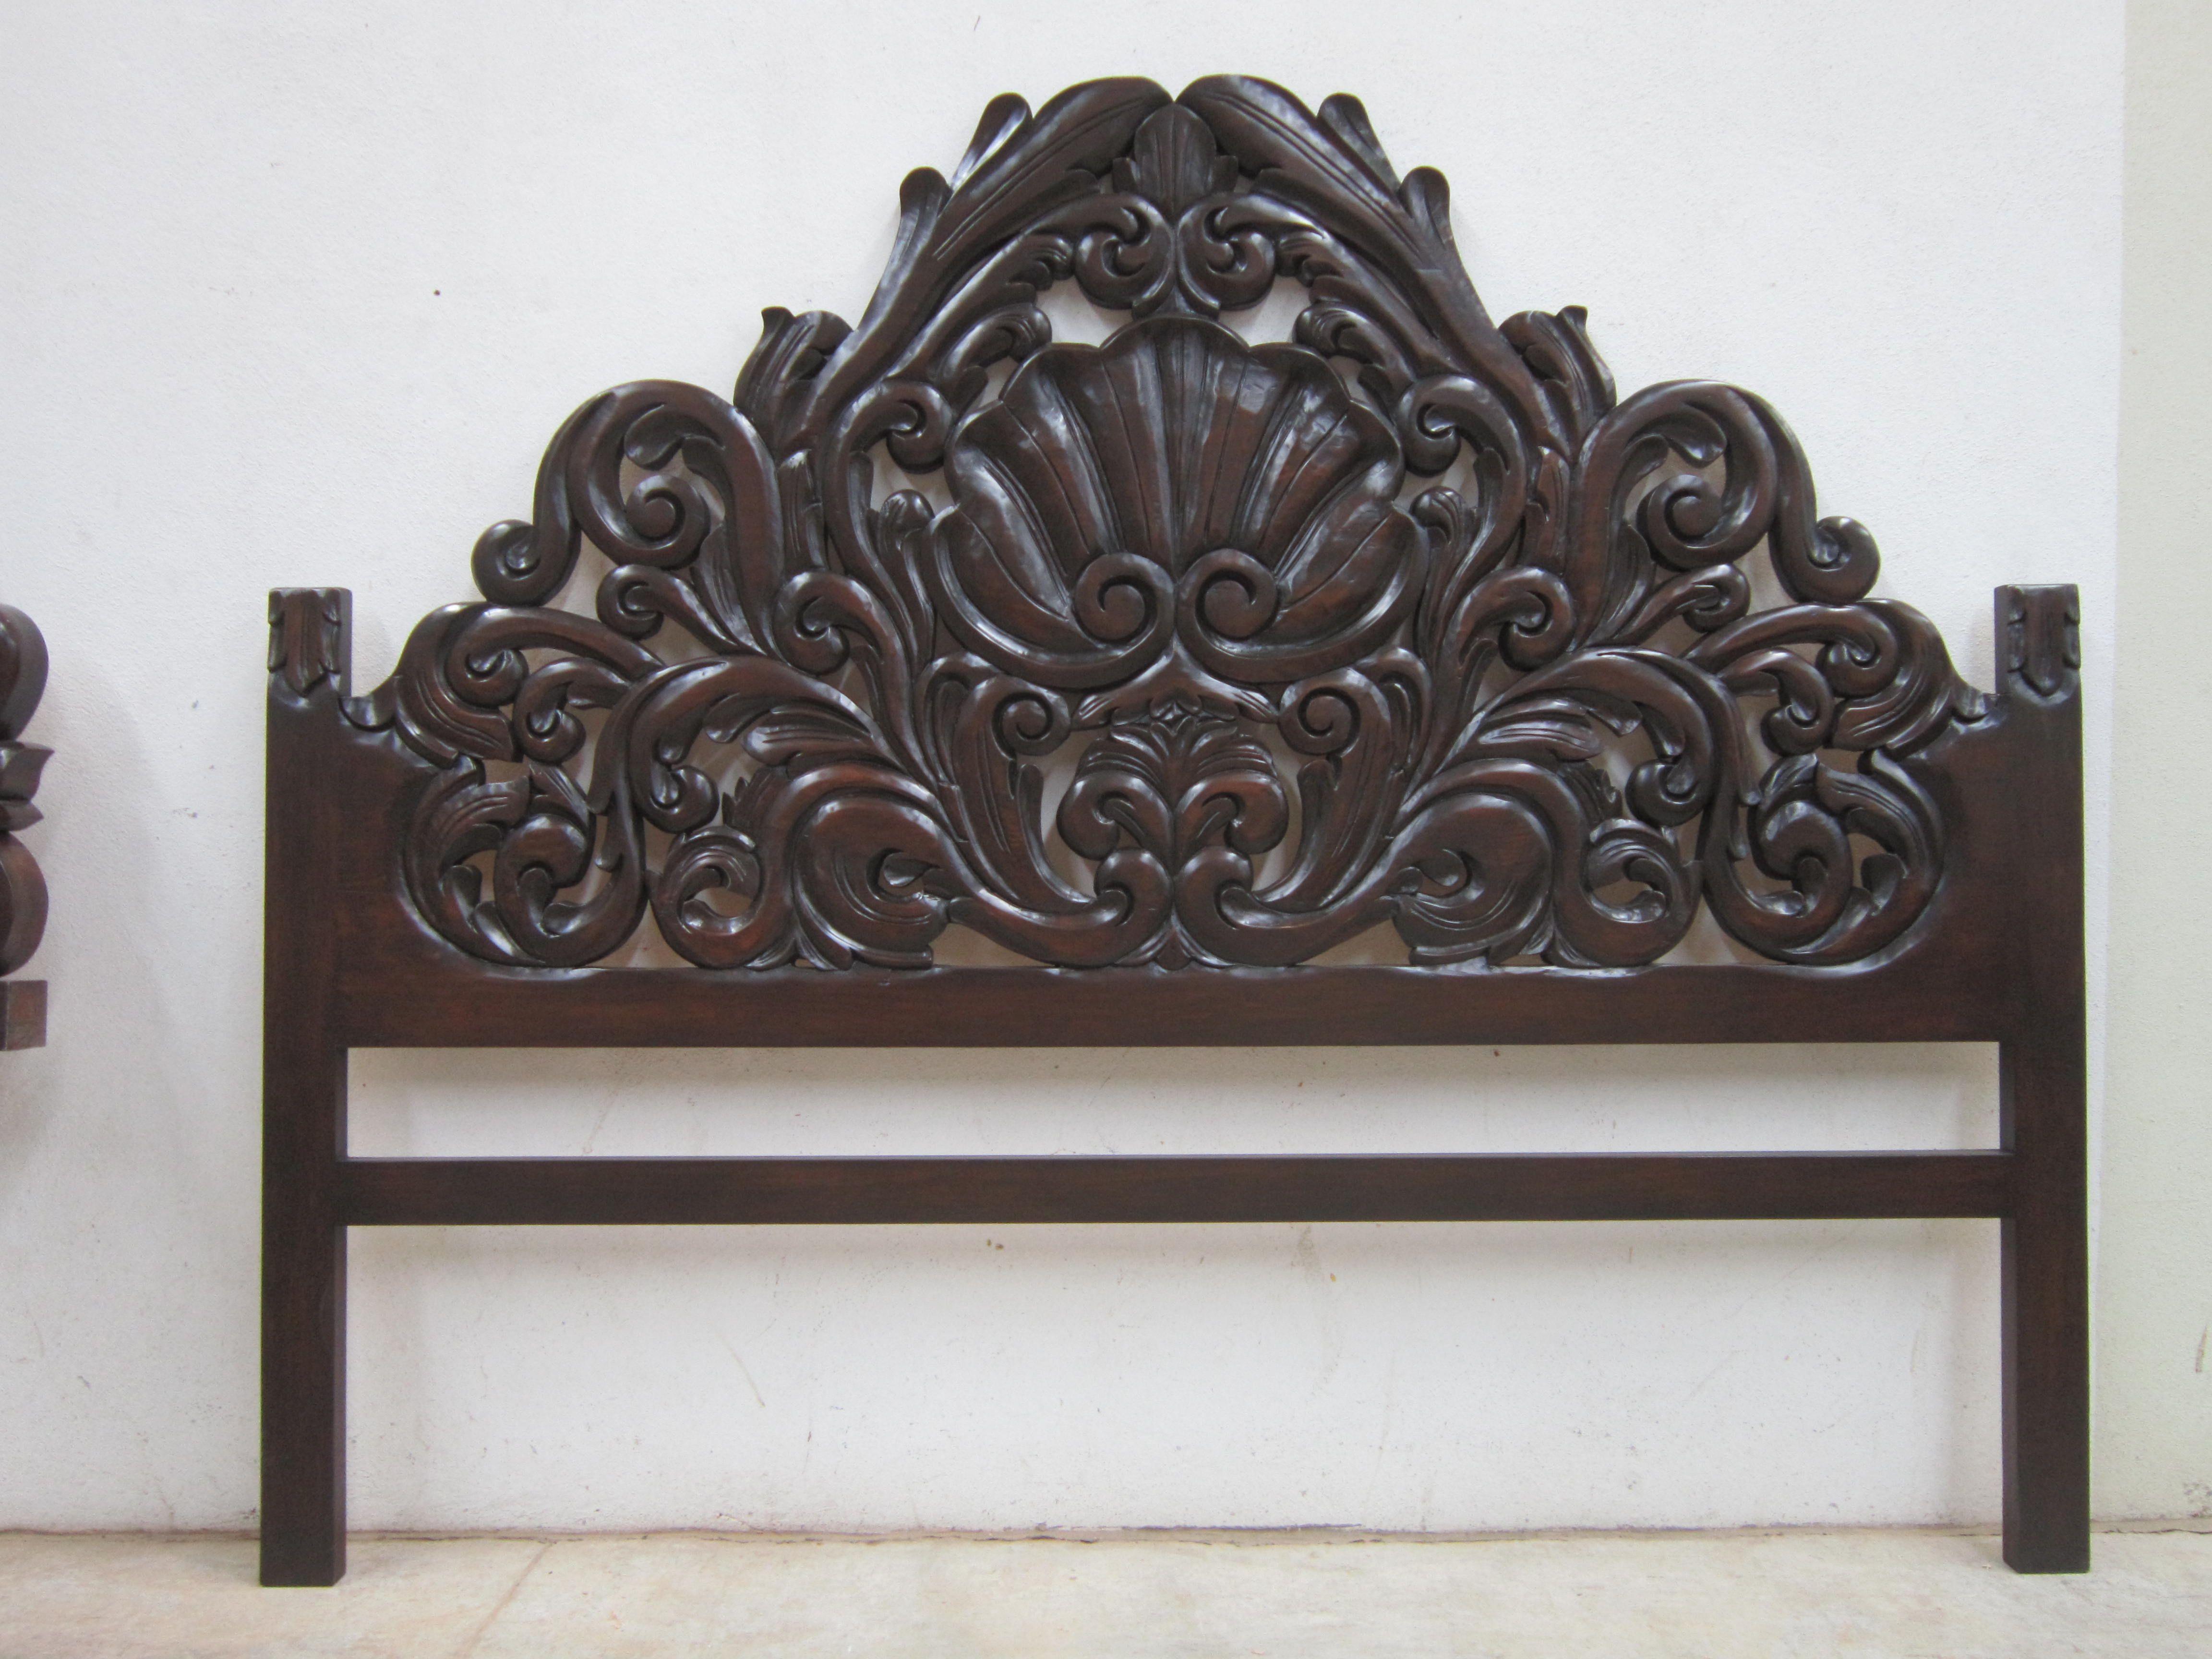 cabecera tallada colonial   whaqt a beautiful wood work ...